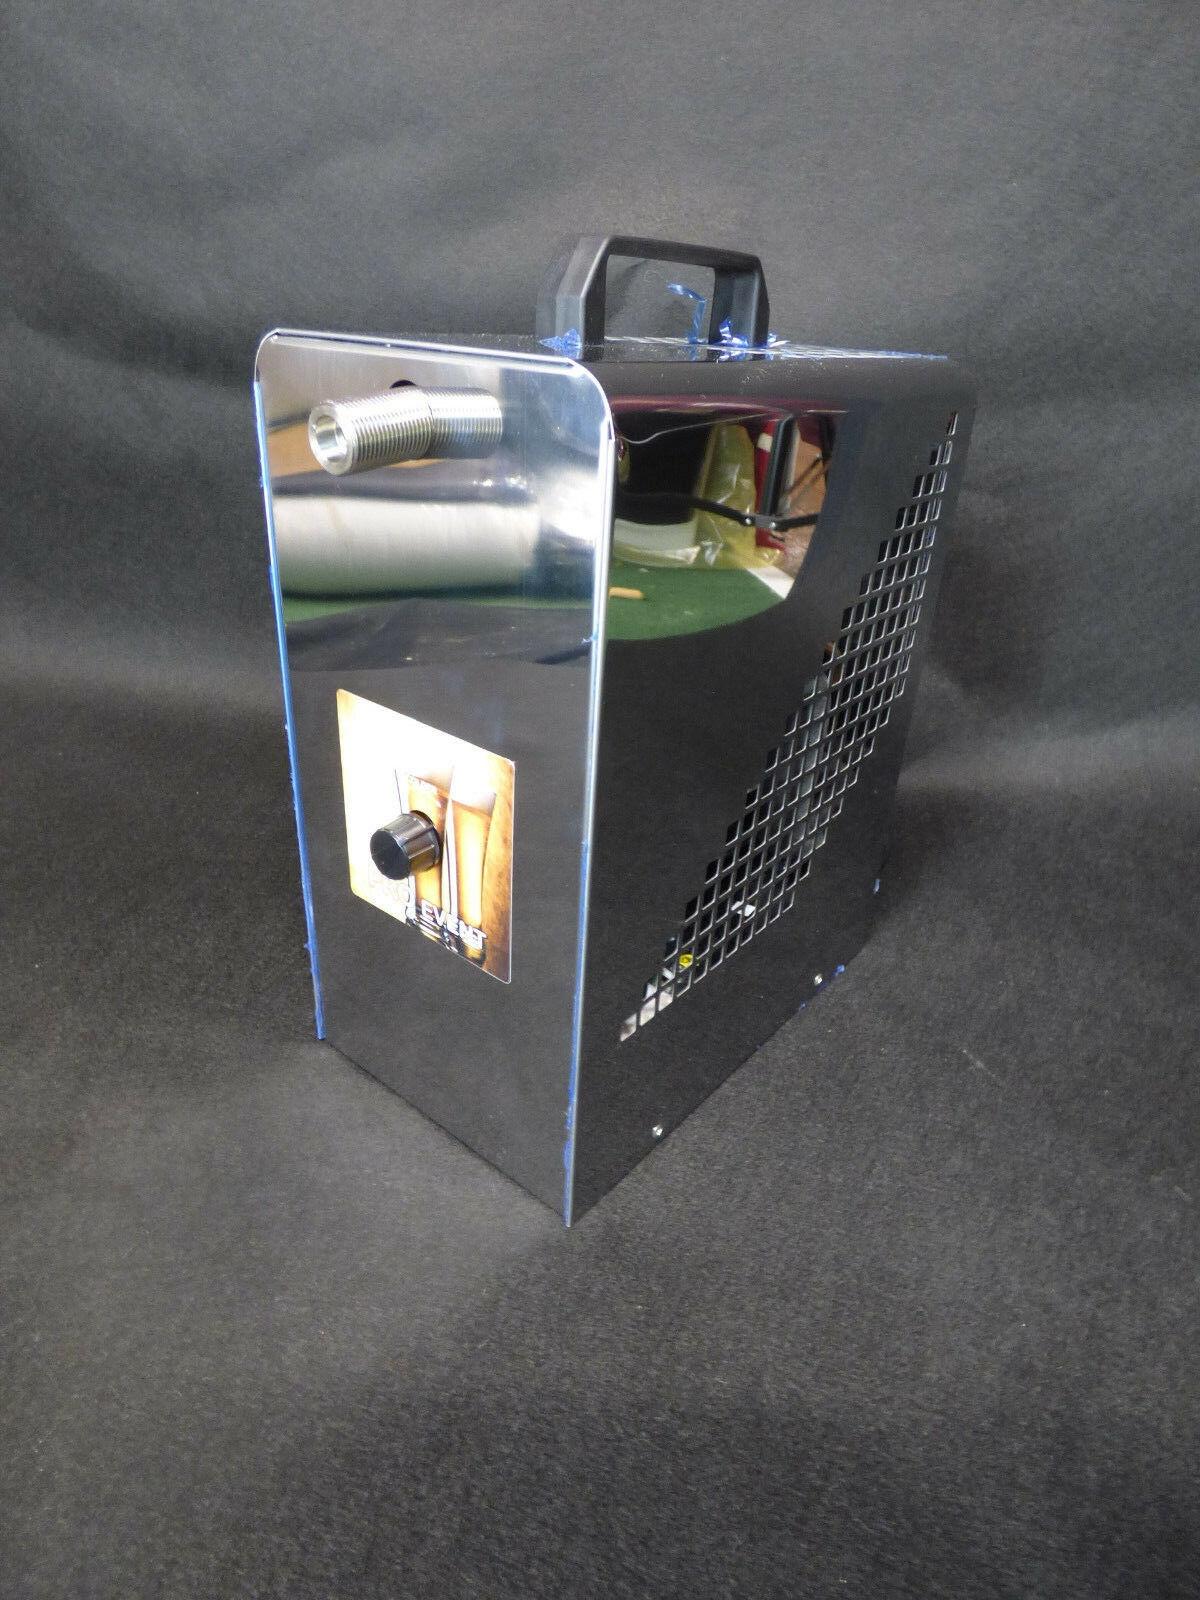 Oprema Zapfanlage Trockenkühler Bierkühler Untertischgerät Unterthekenkühlgerät